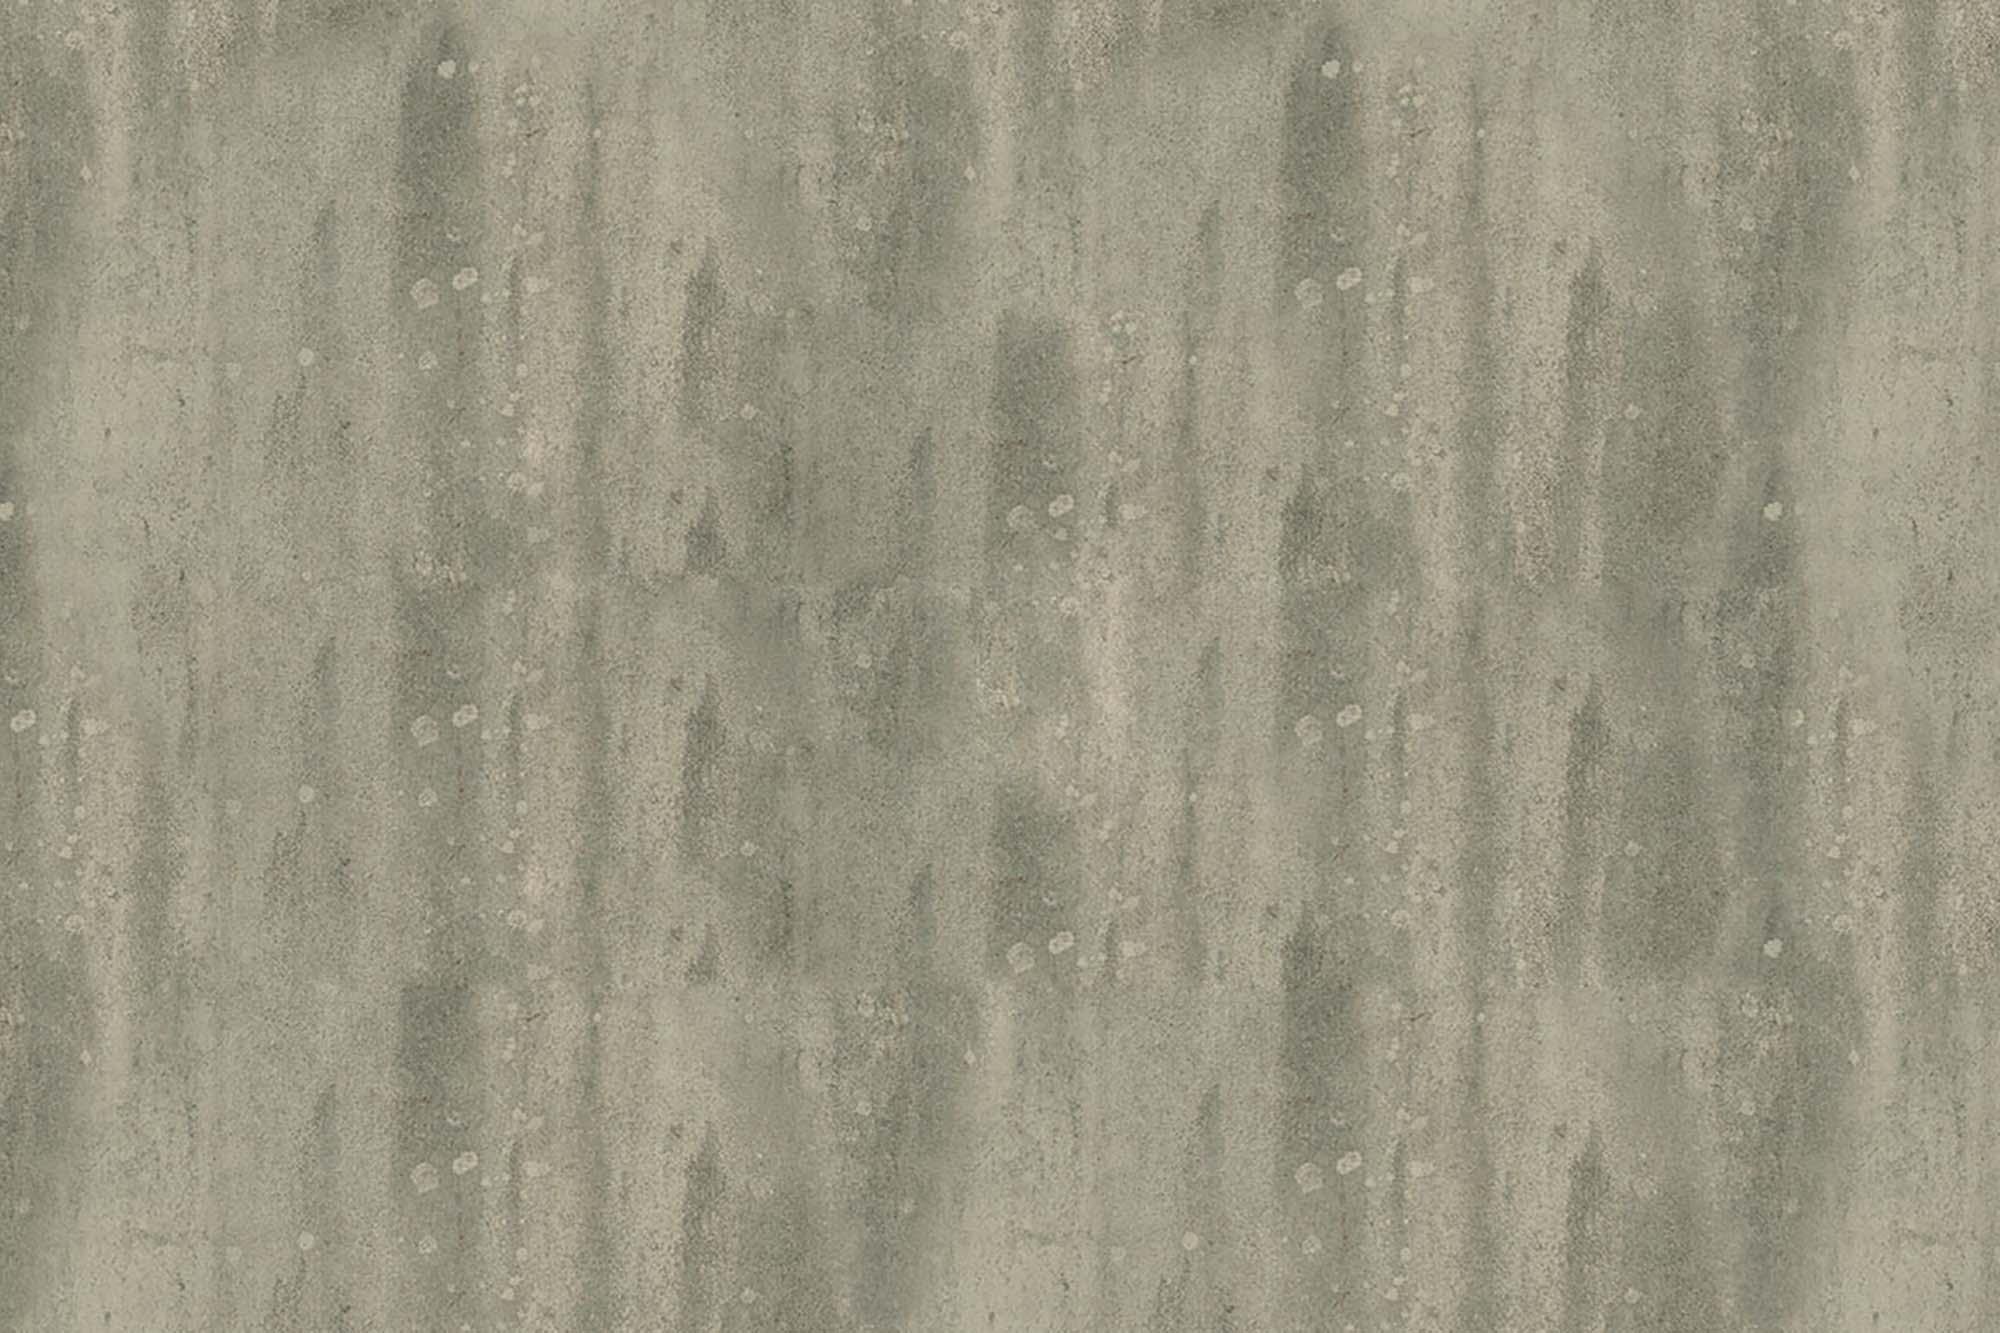 Seamless Grunge Pattern 4